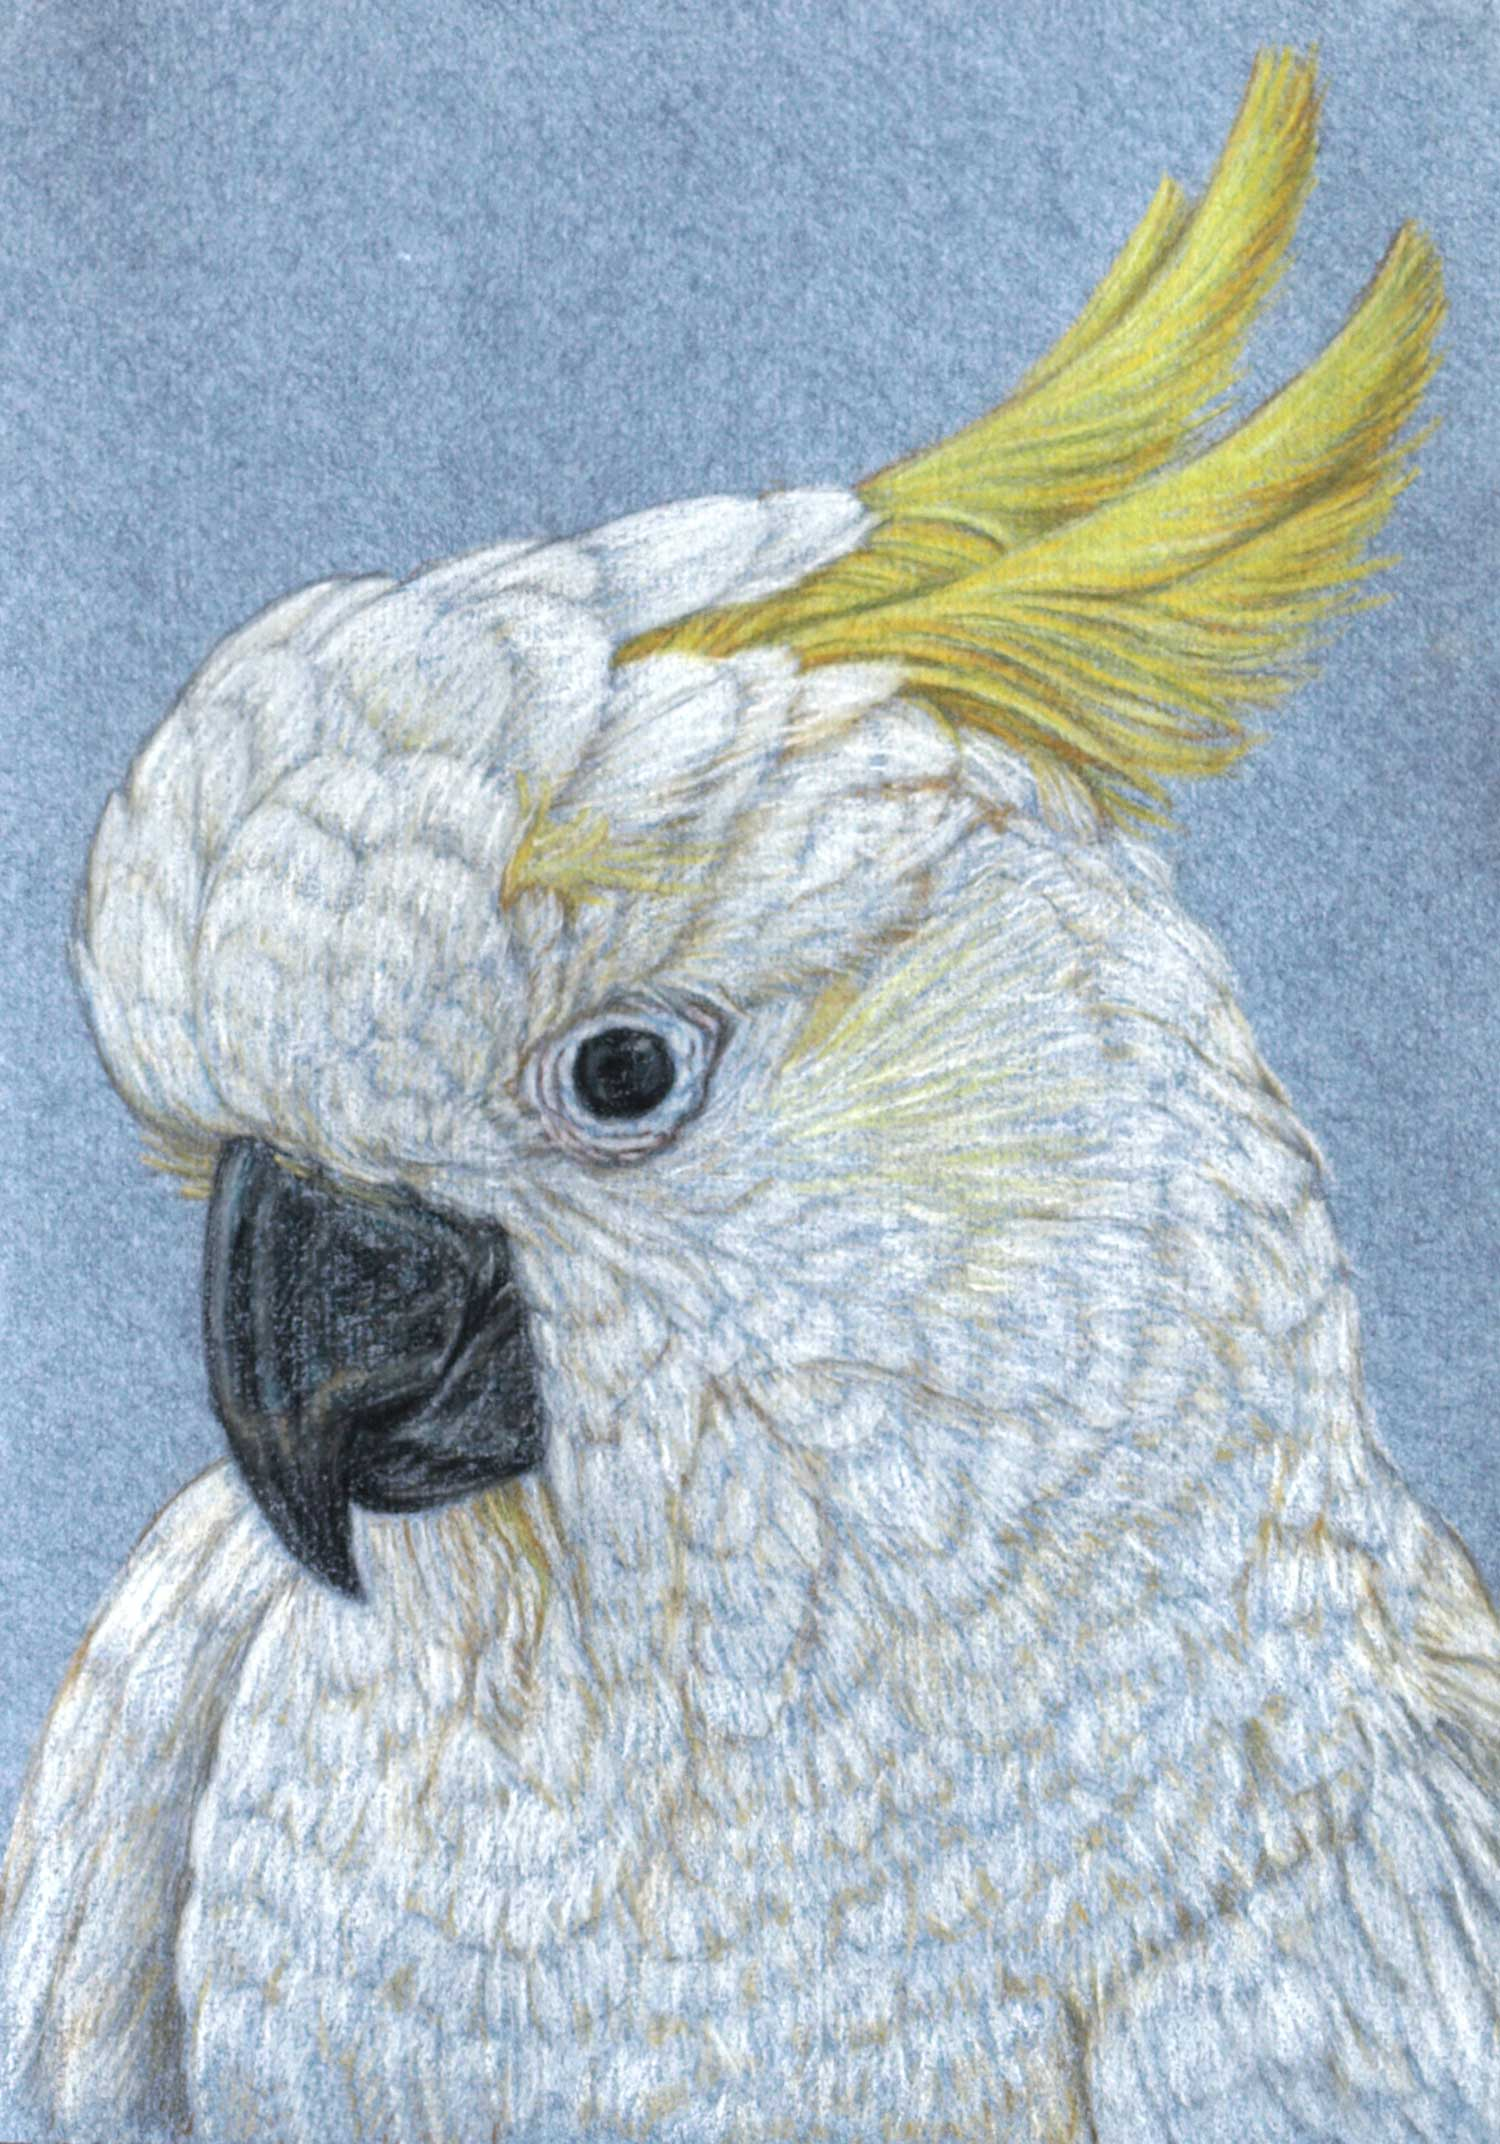 sulphur-crested-cockatoo-2-drawing-rachel-newling.jpg